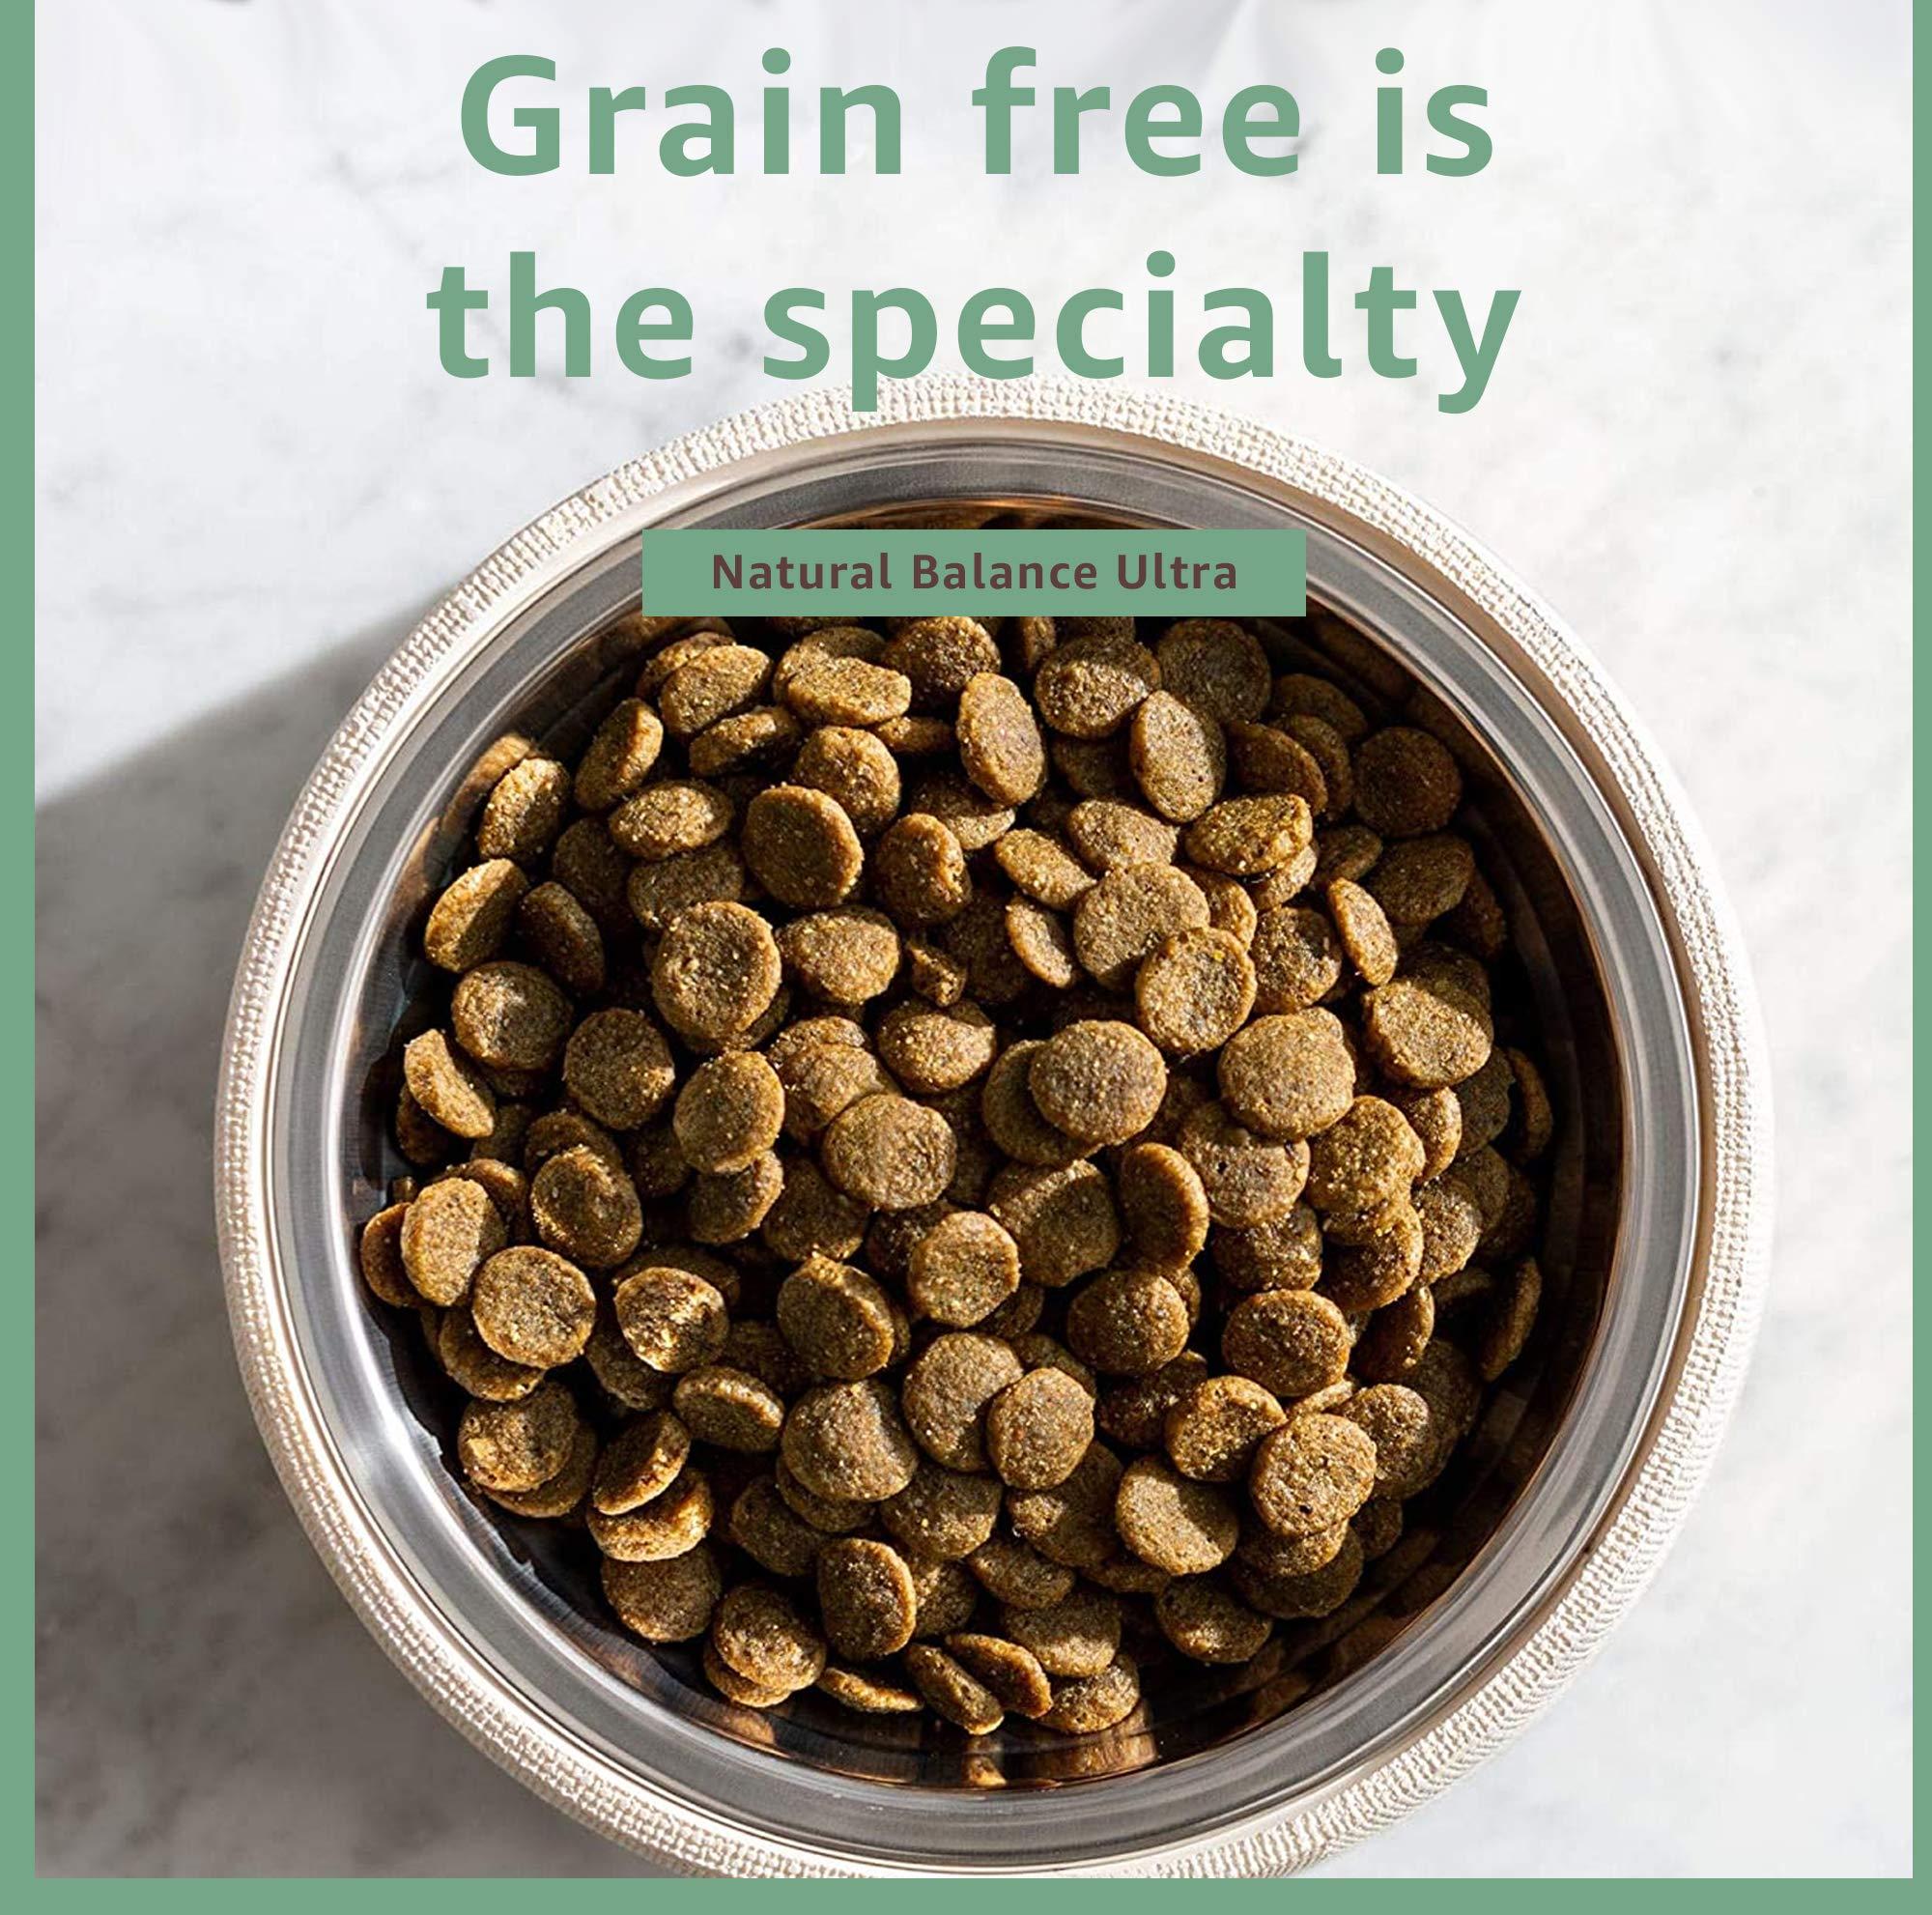 Grain free with Natural Balance